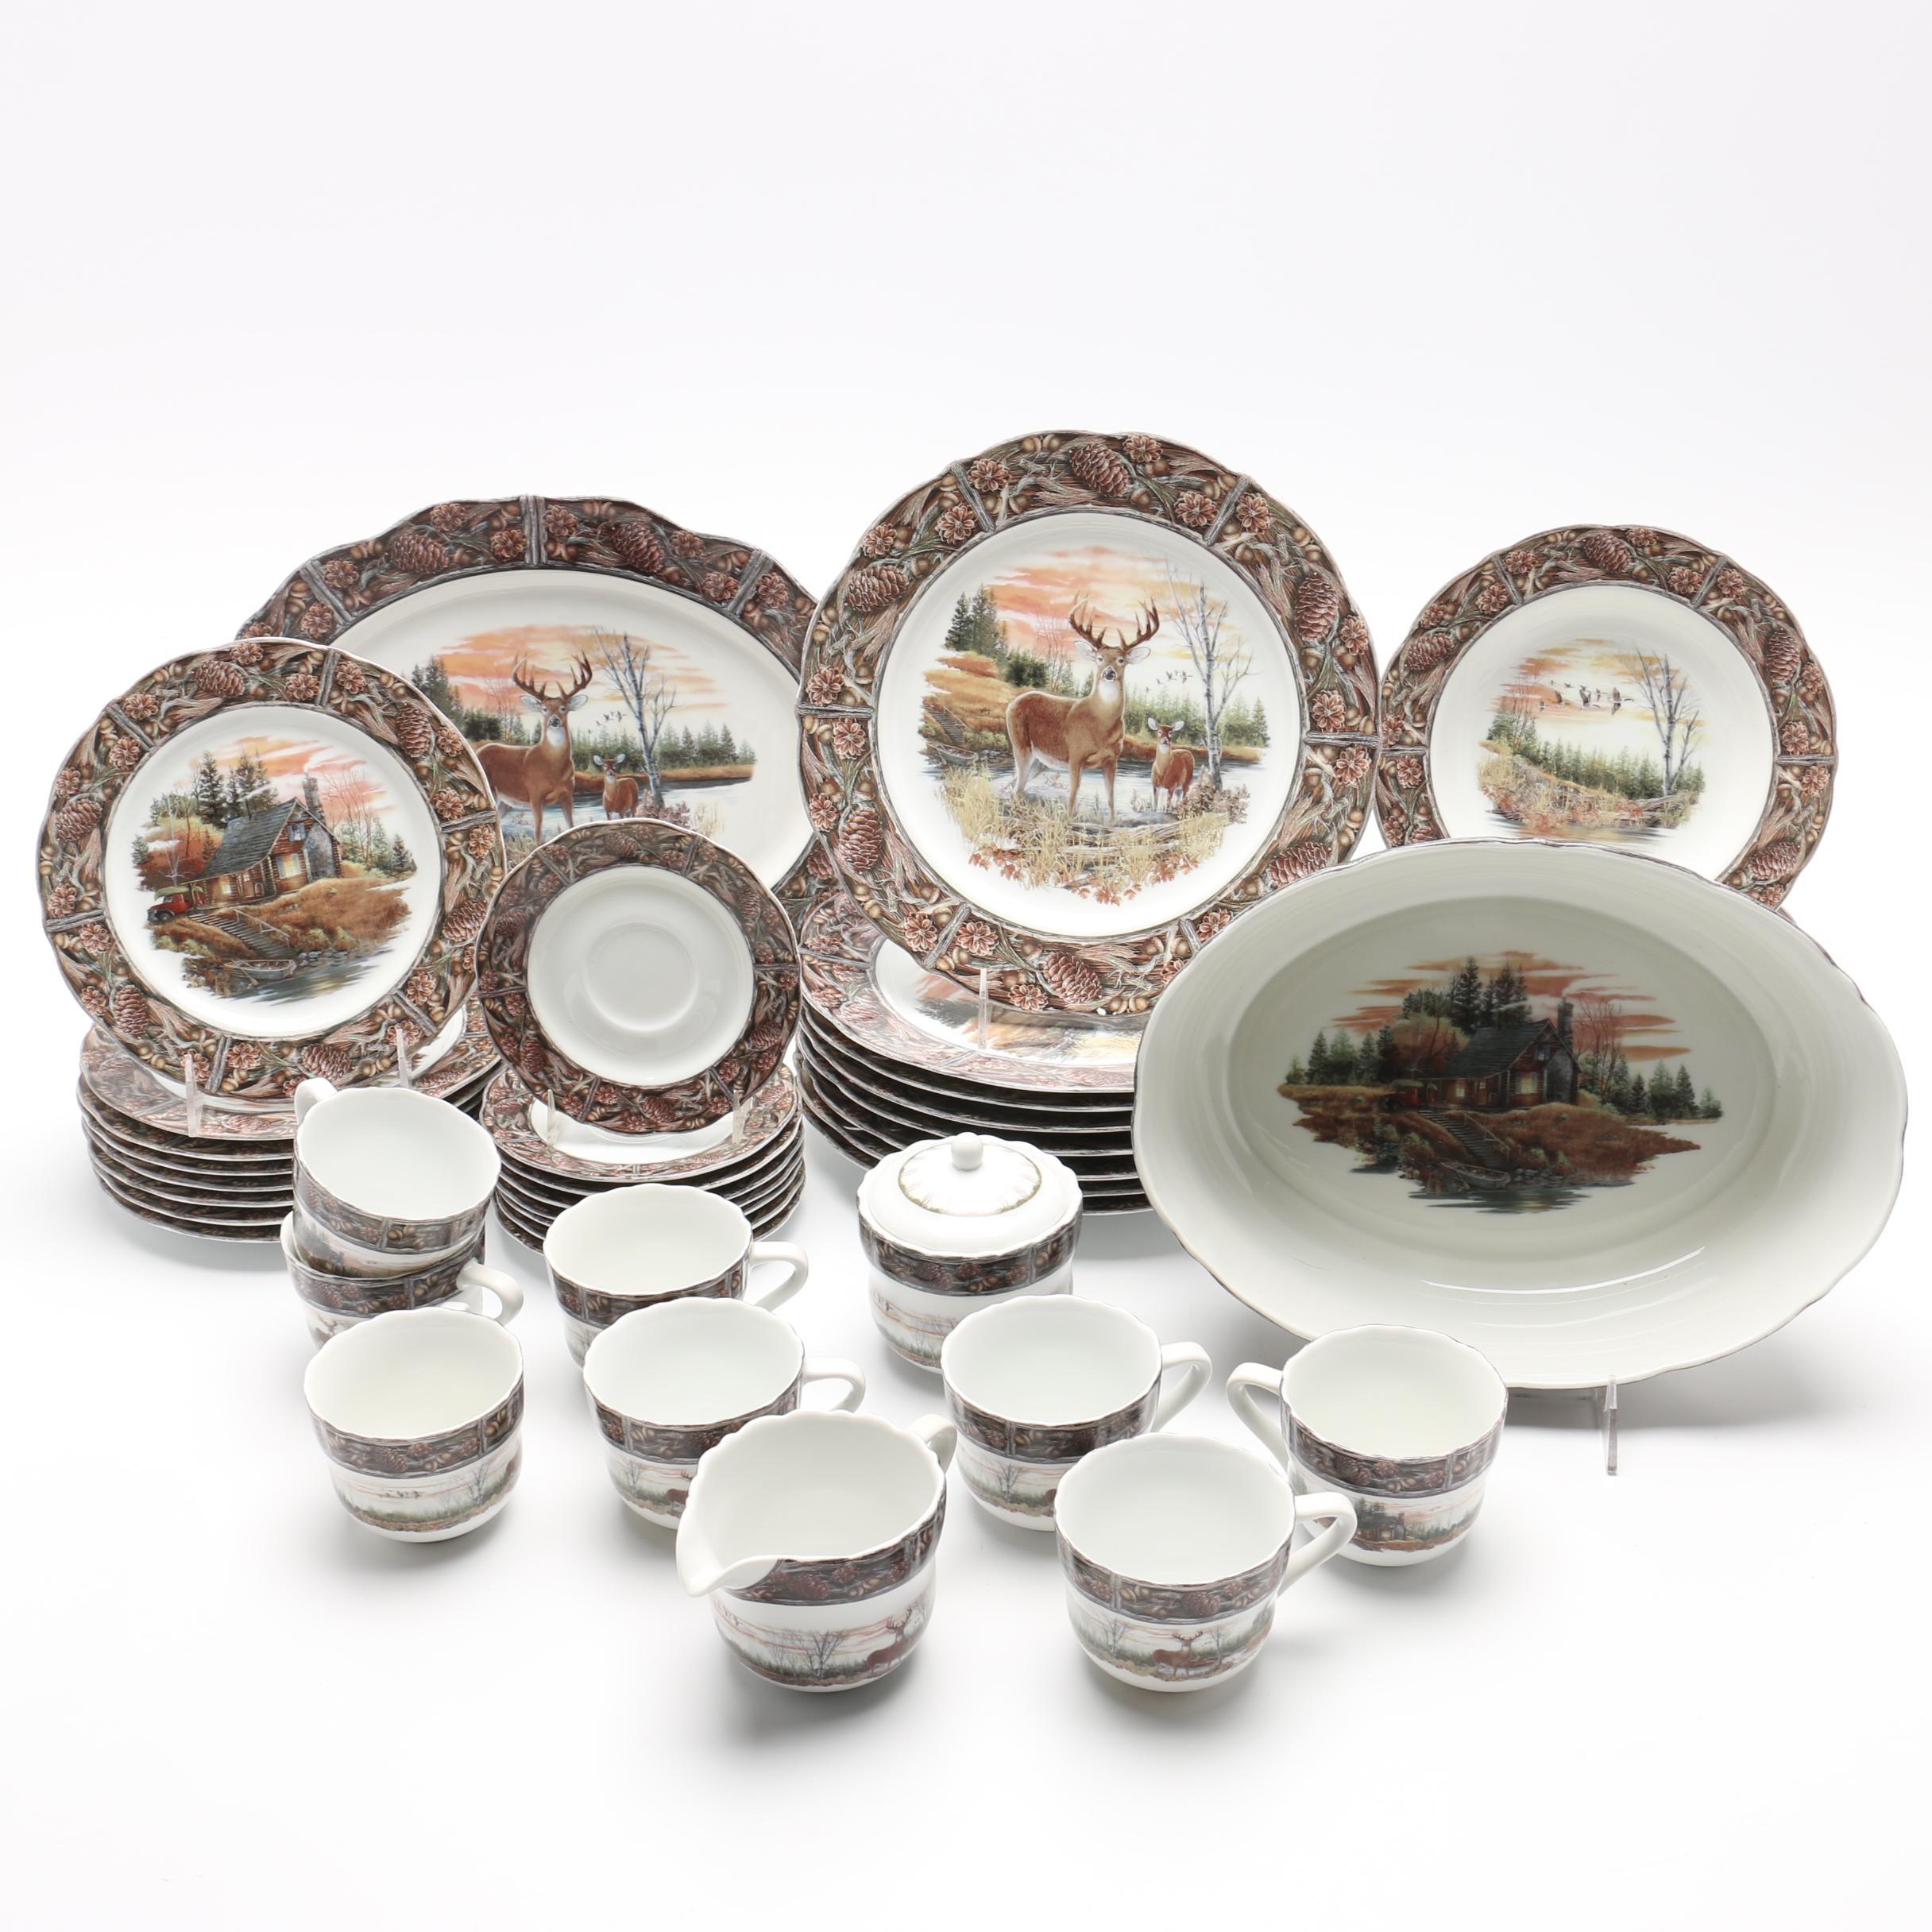 Franklin Mint  The Hunting Lodge  Porcelain Dinnerware ...  sc 1 st  EBTH.com & Franklin Mint